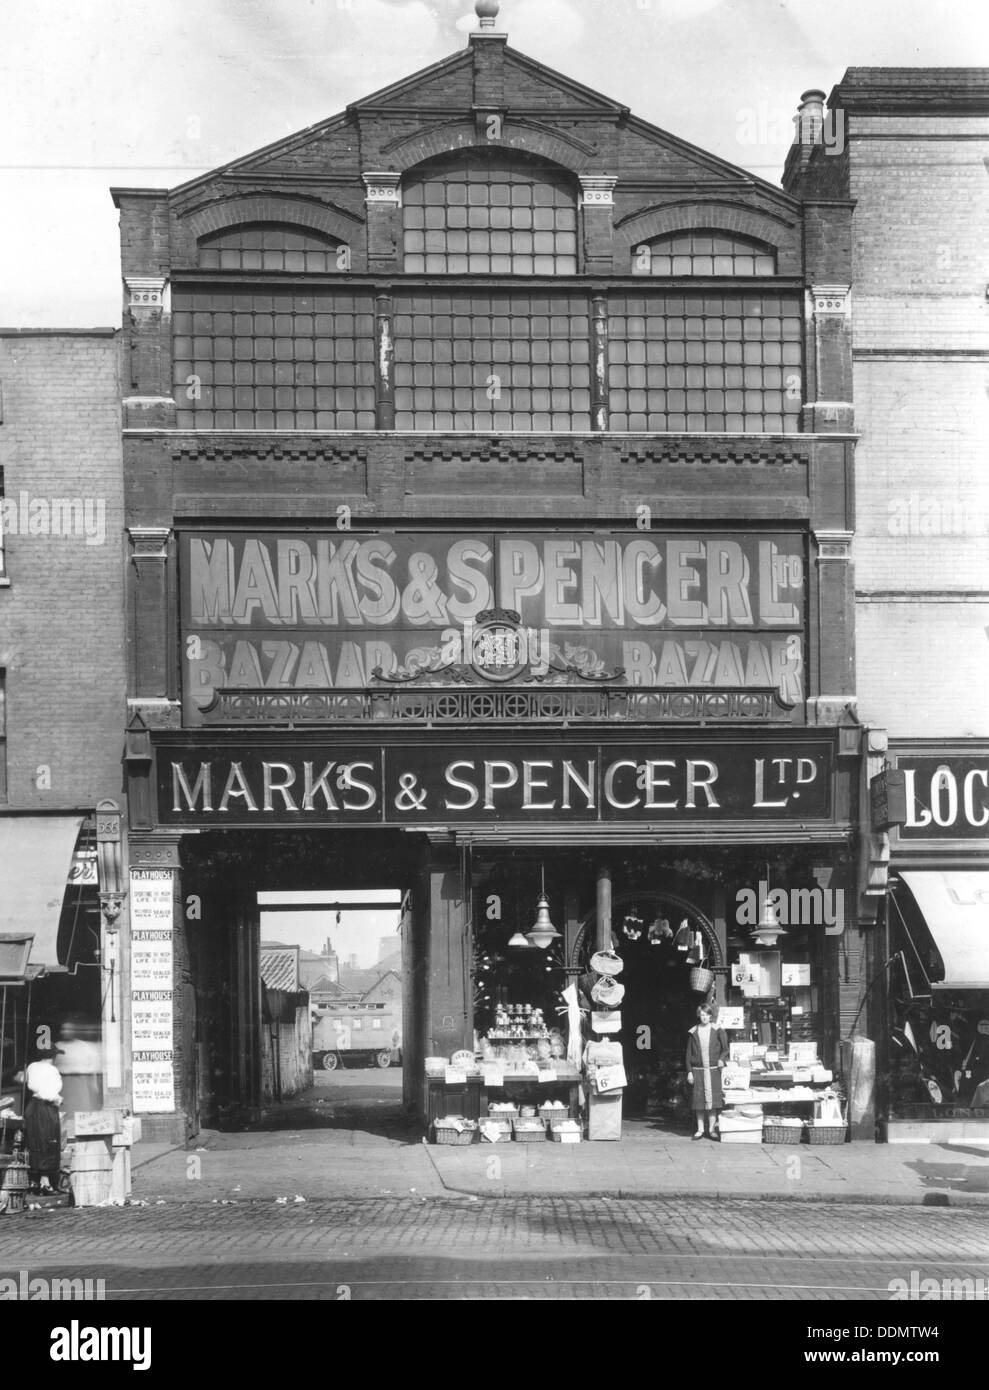 Marks & Spencer Ltd, Stratford, London, 1910. - Stock Image